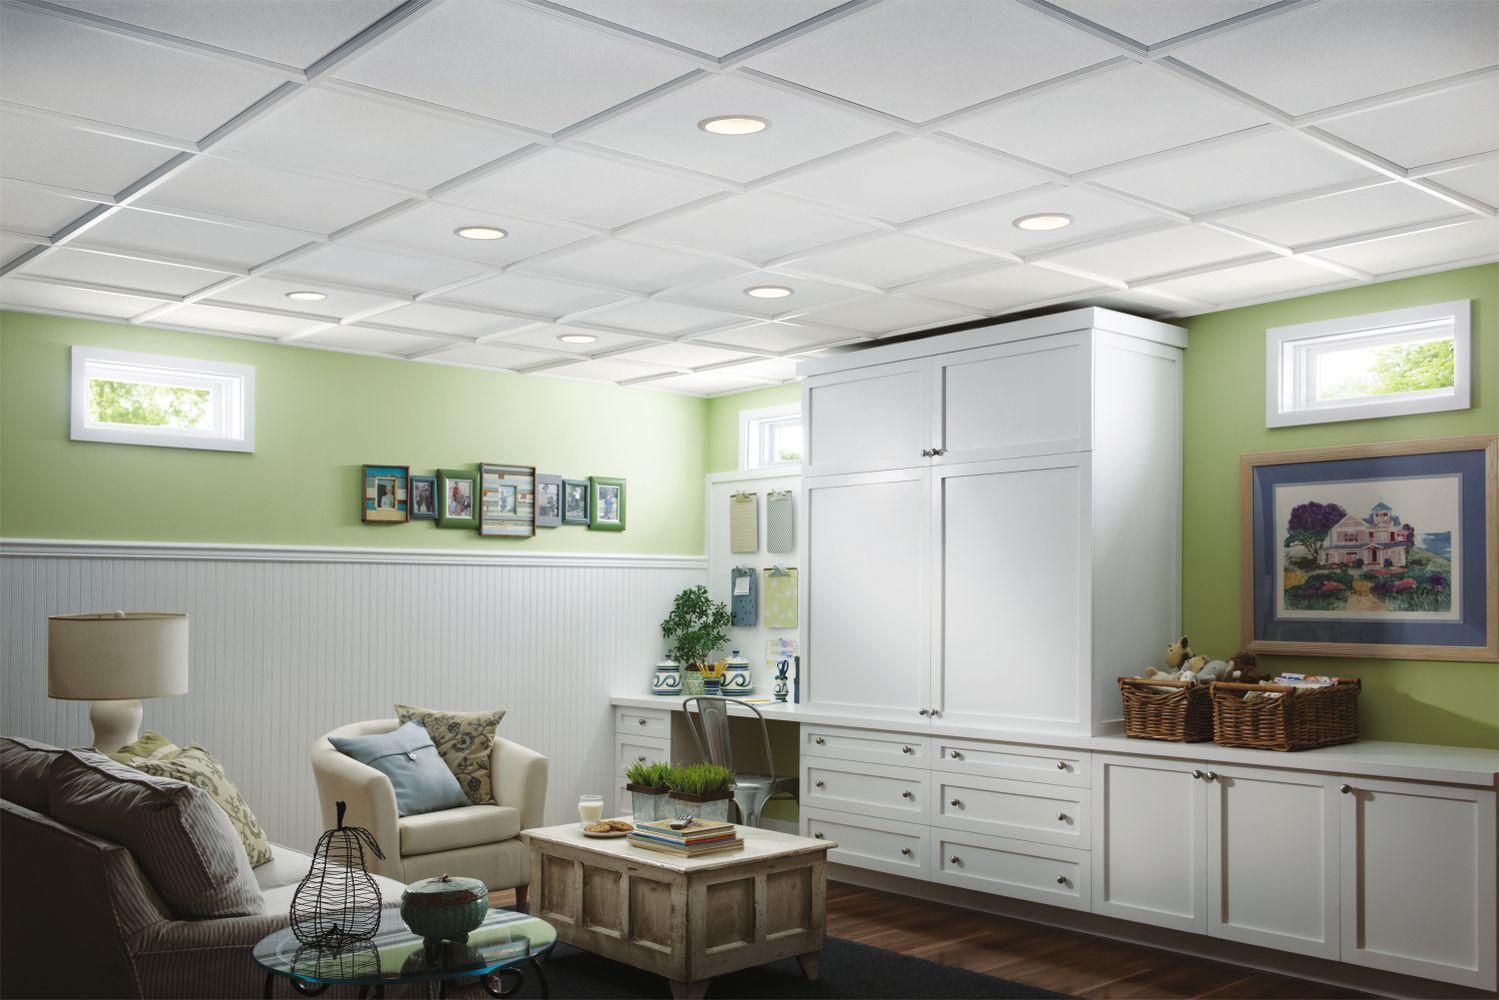 Armstrong Decorative Ceiling Tiles Decorative Design